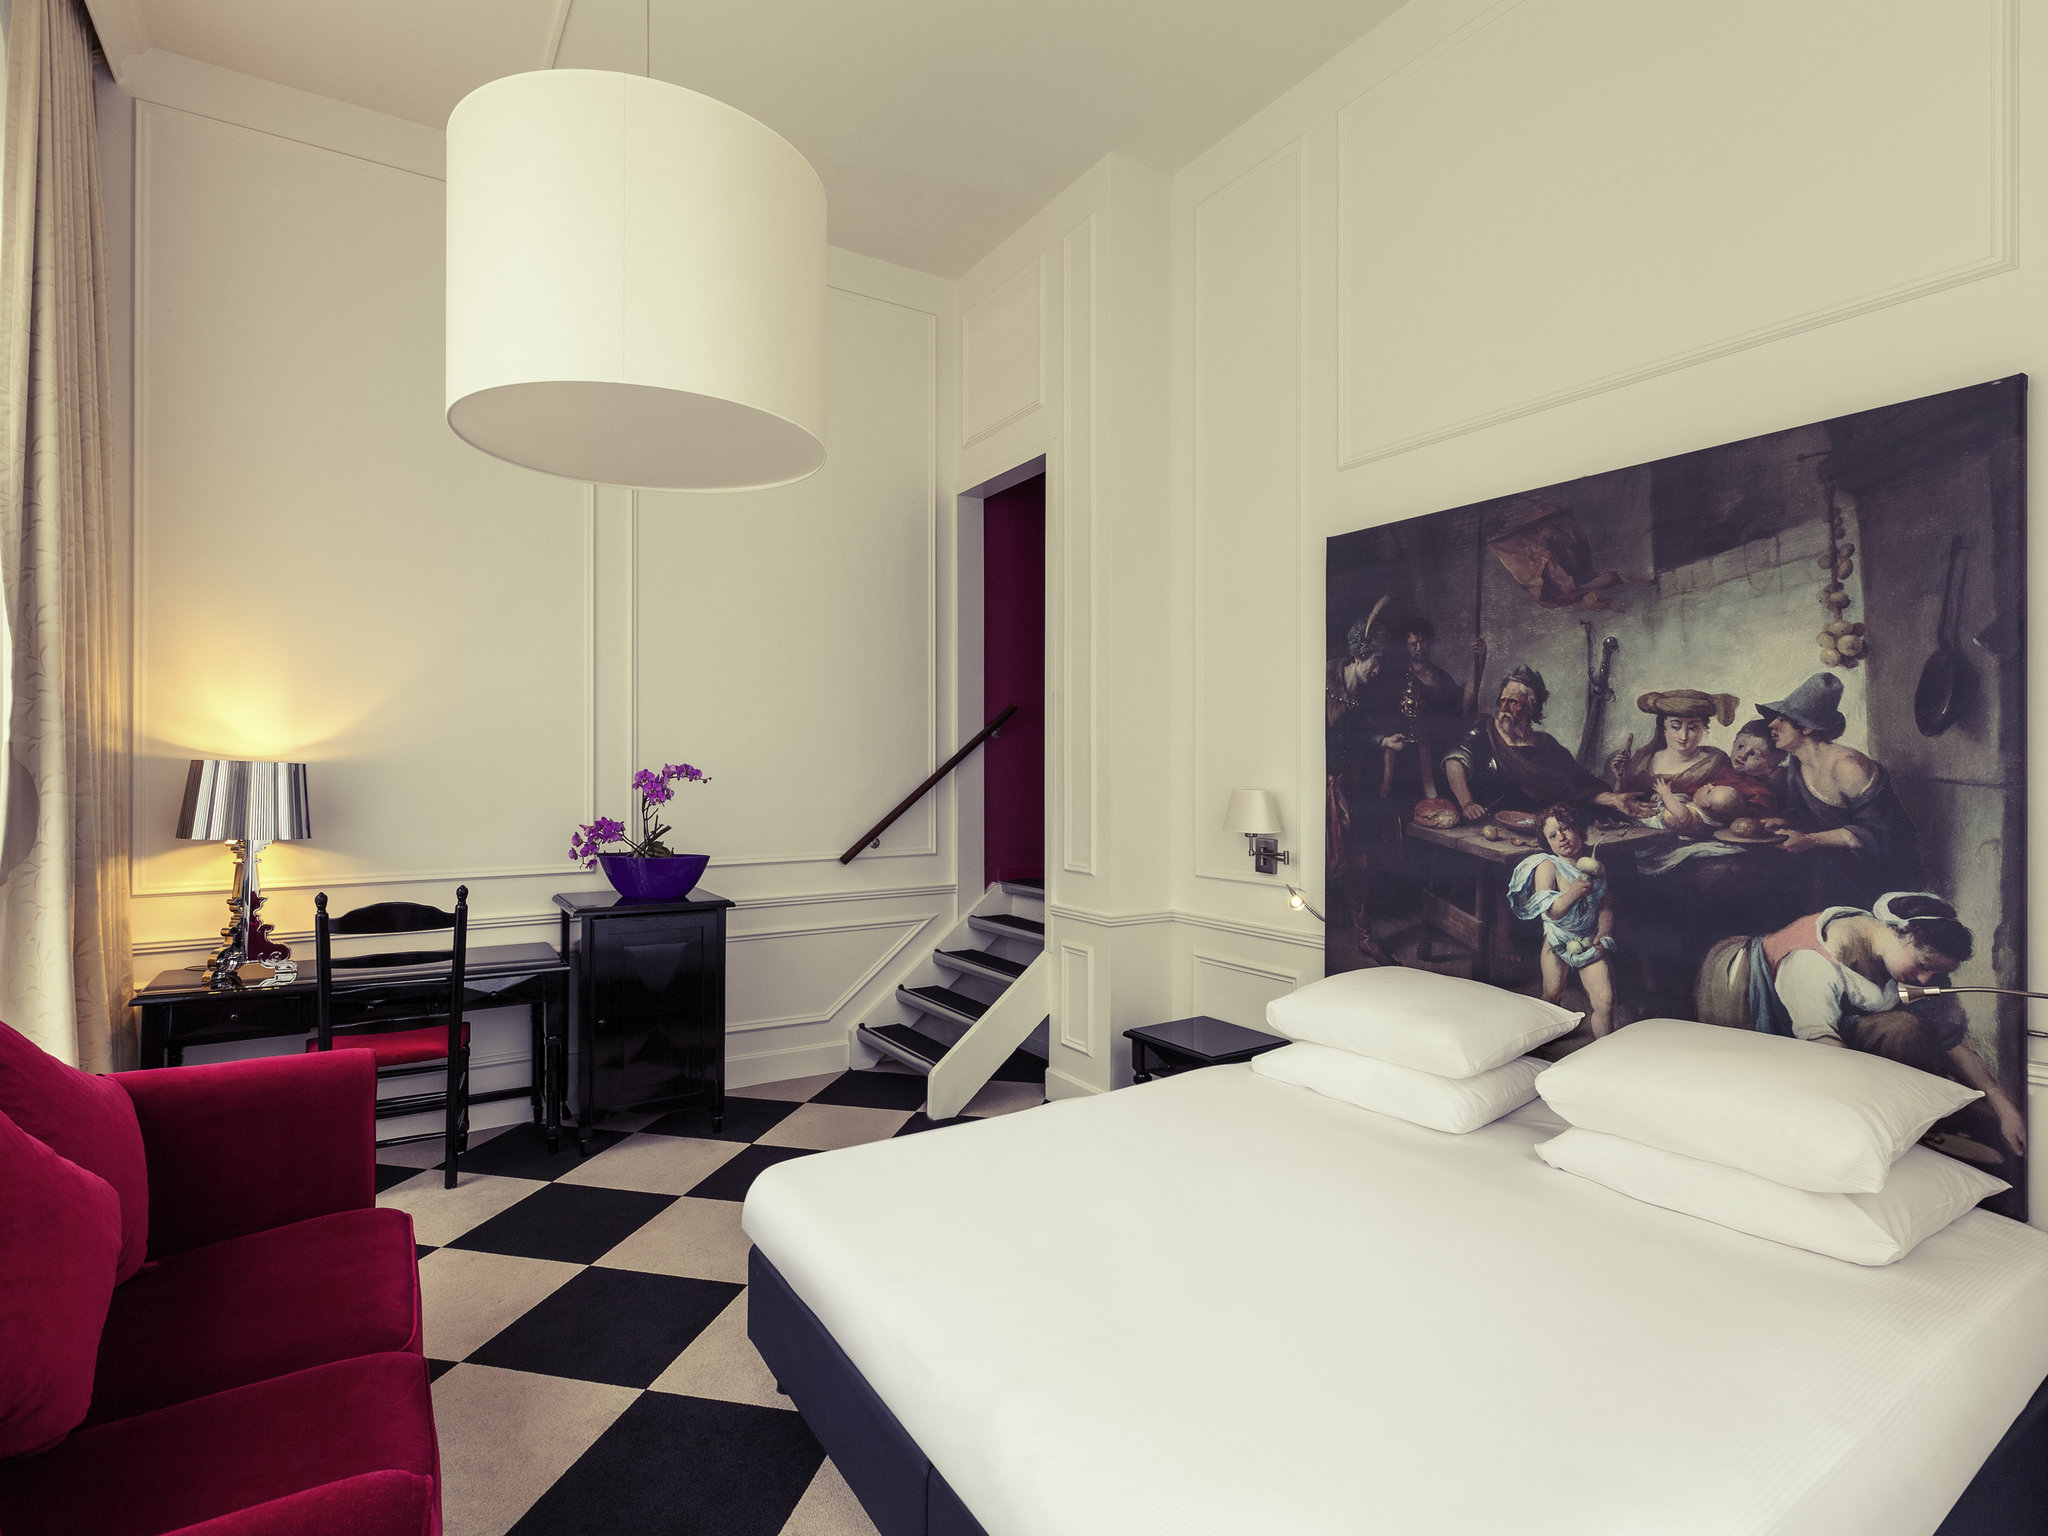 فندق - مركيور MERCURE أمستردام سنتر كانال ديستركت